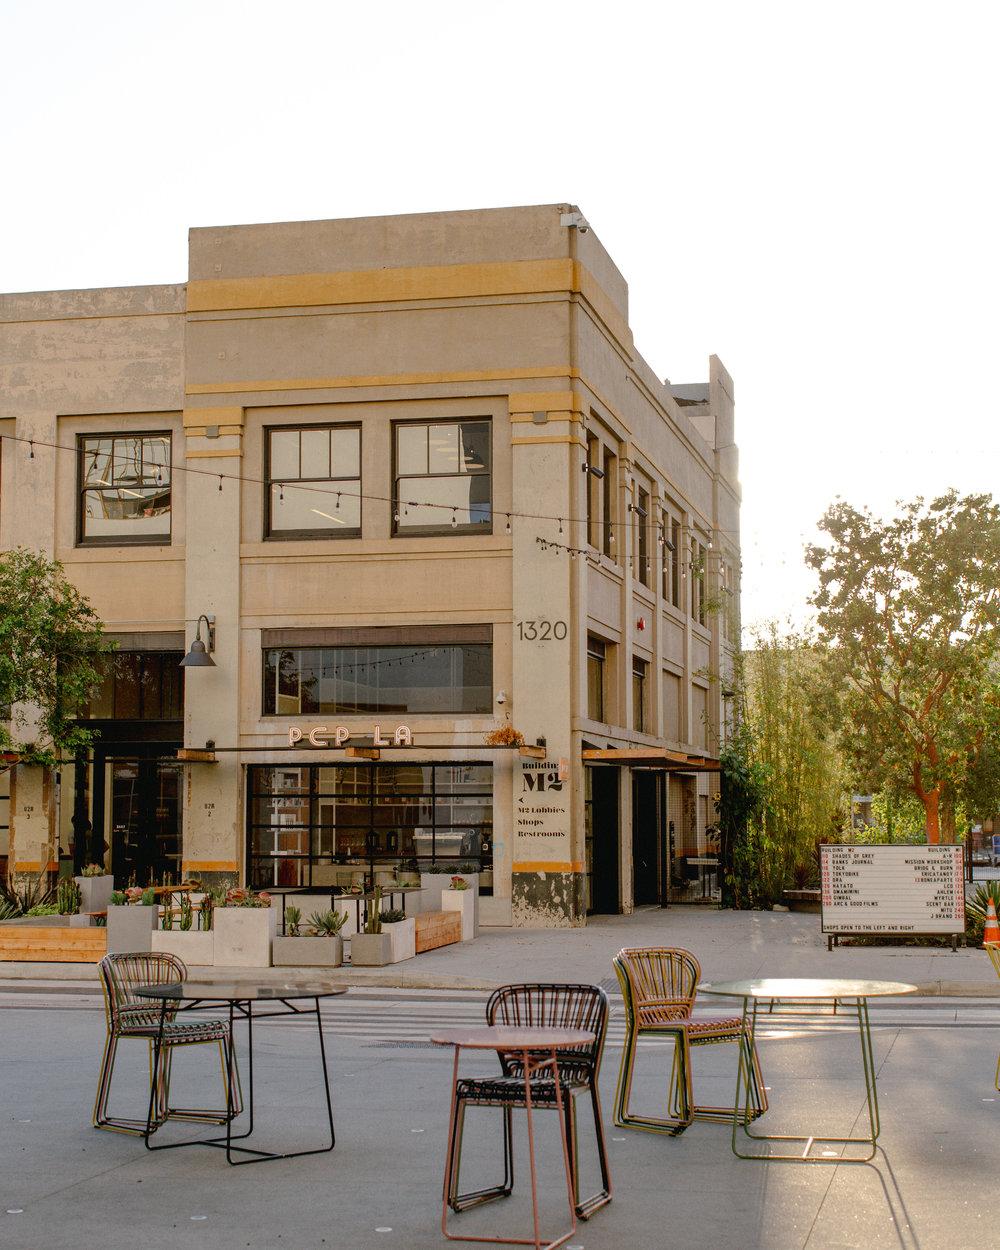 LA-Downtowner-PCP_01.jpg